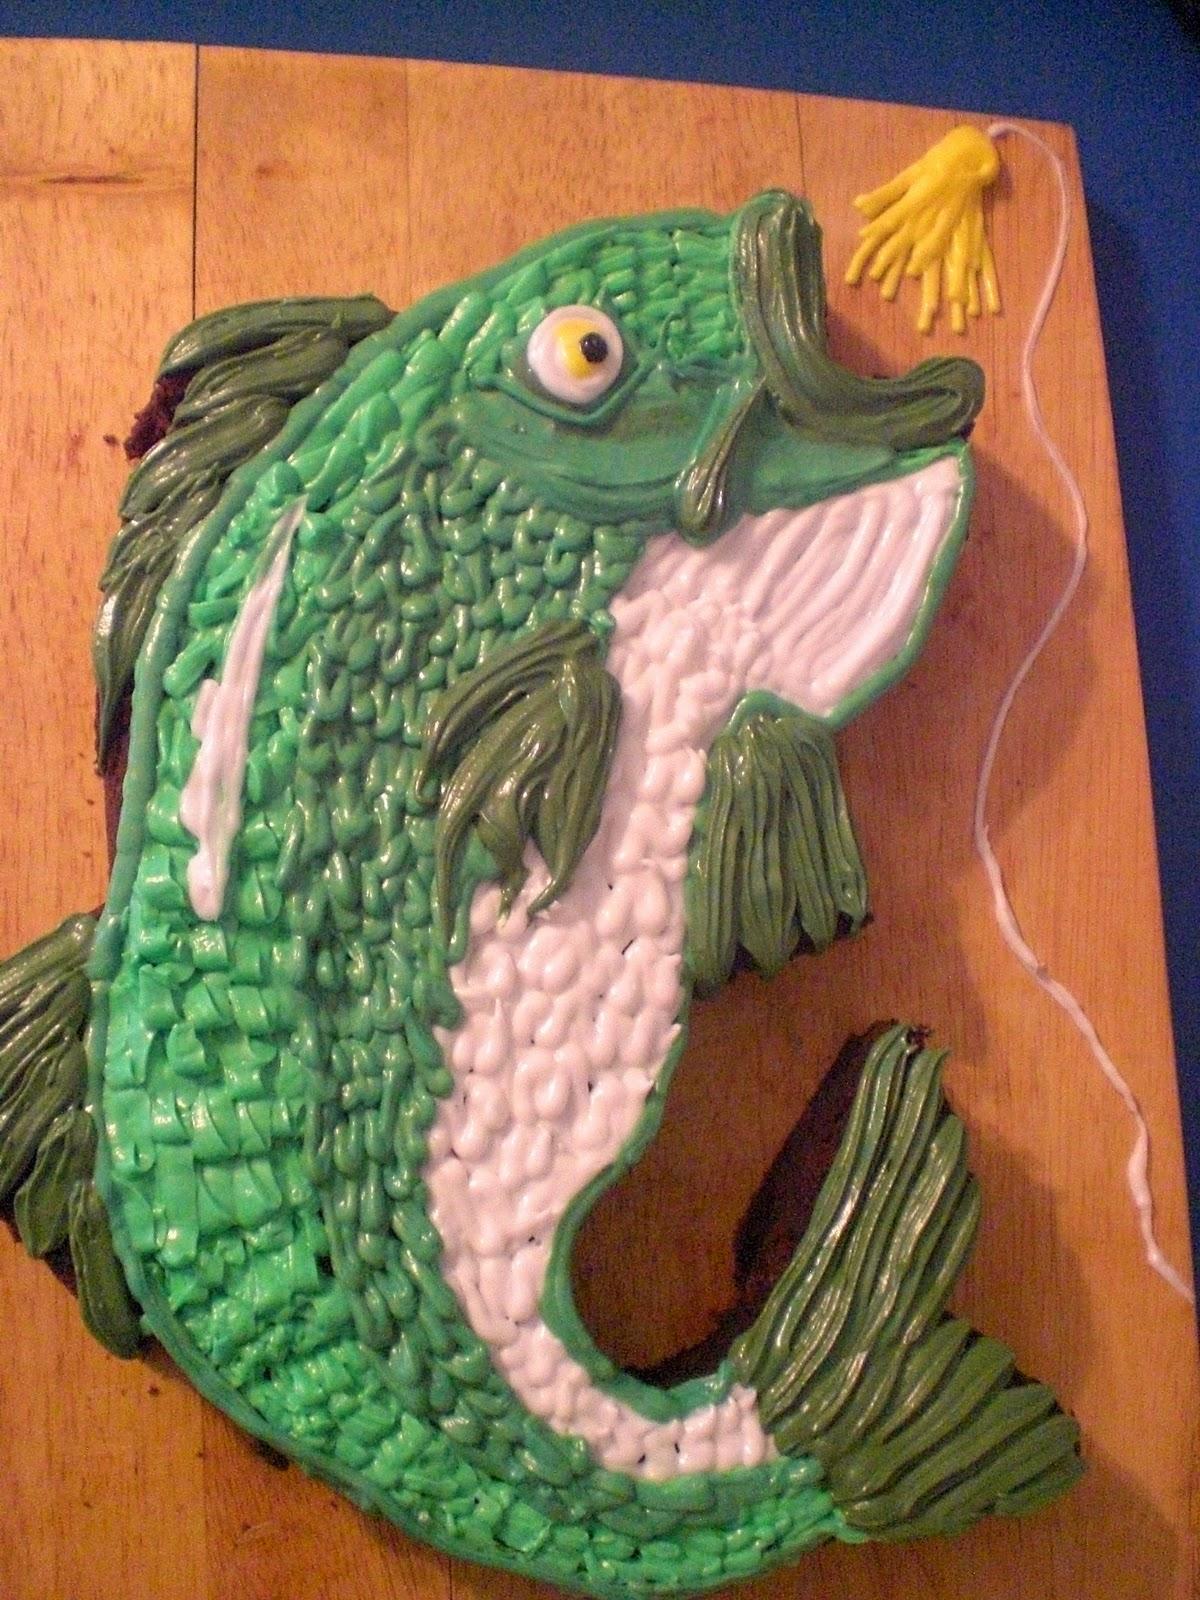 Easy Fish Cake Designs